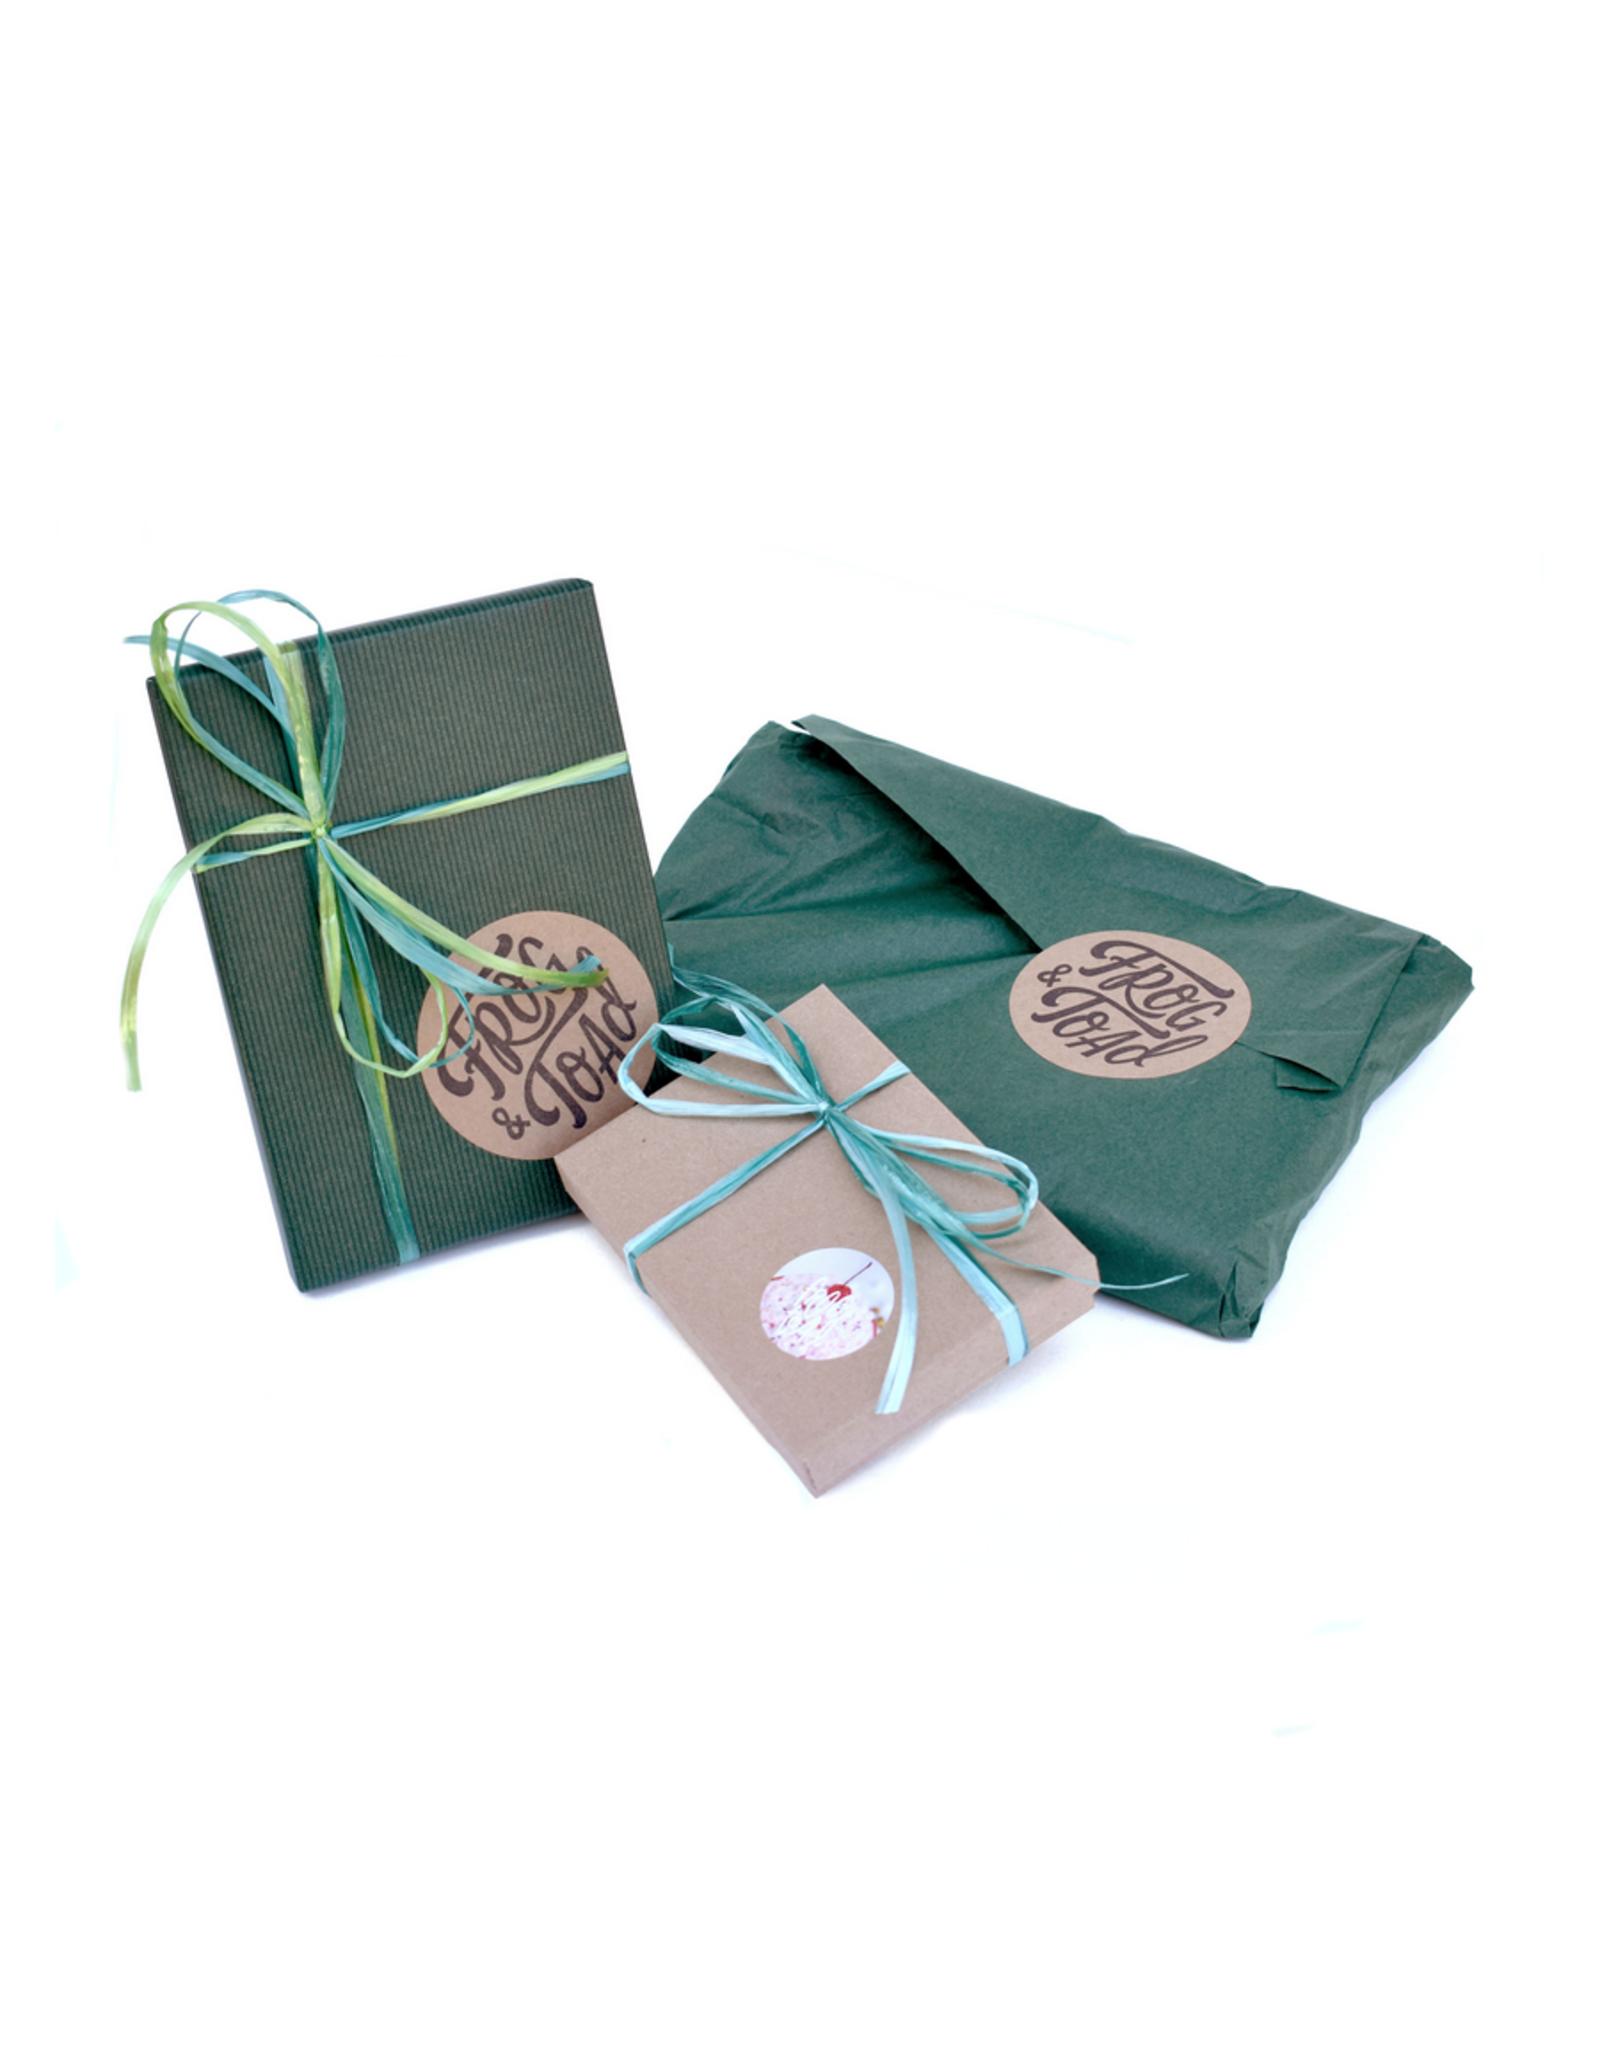 Gift Wrap - Donate to Non-Violence Institute!